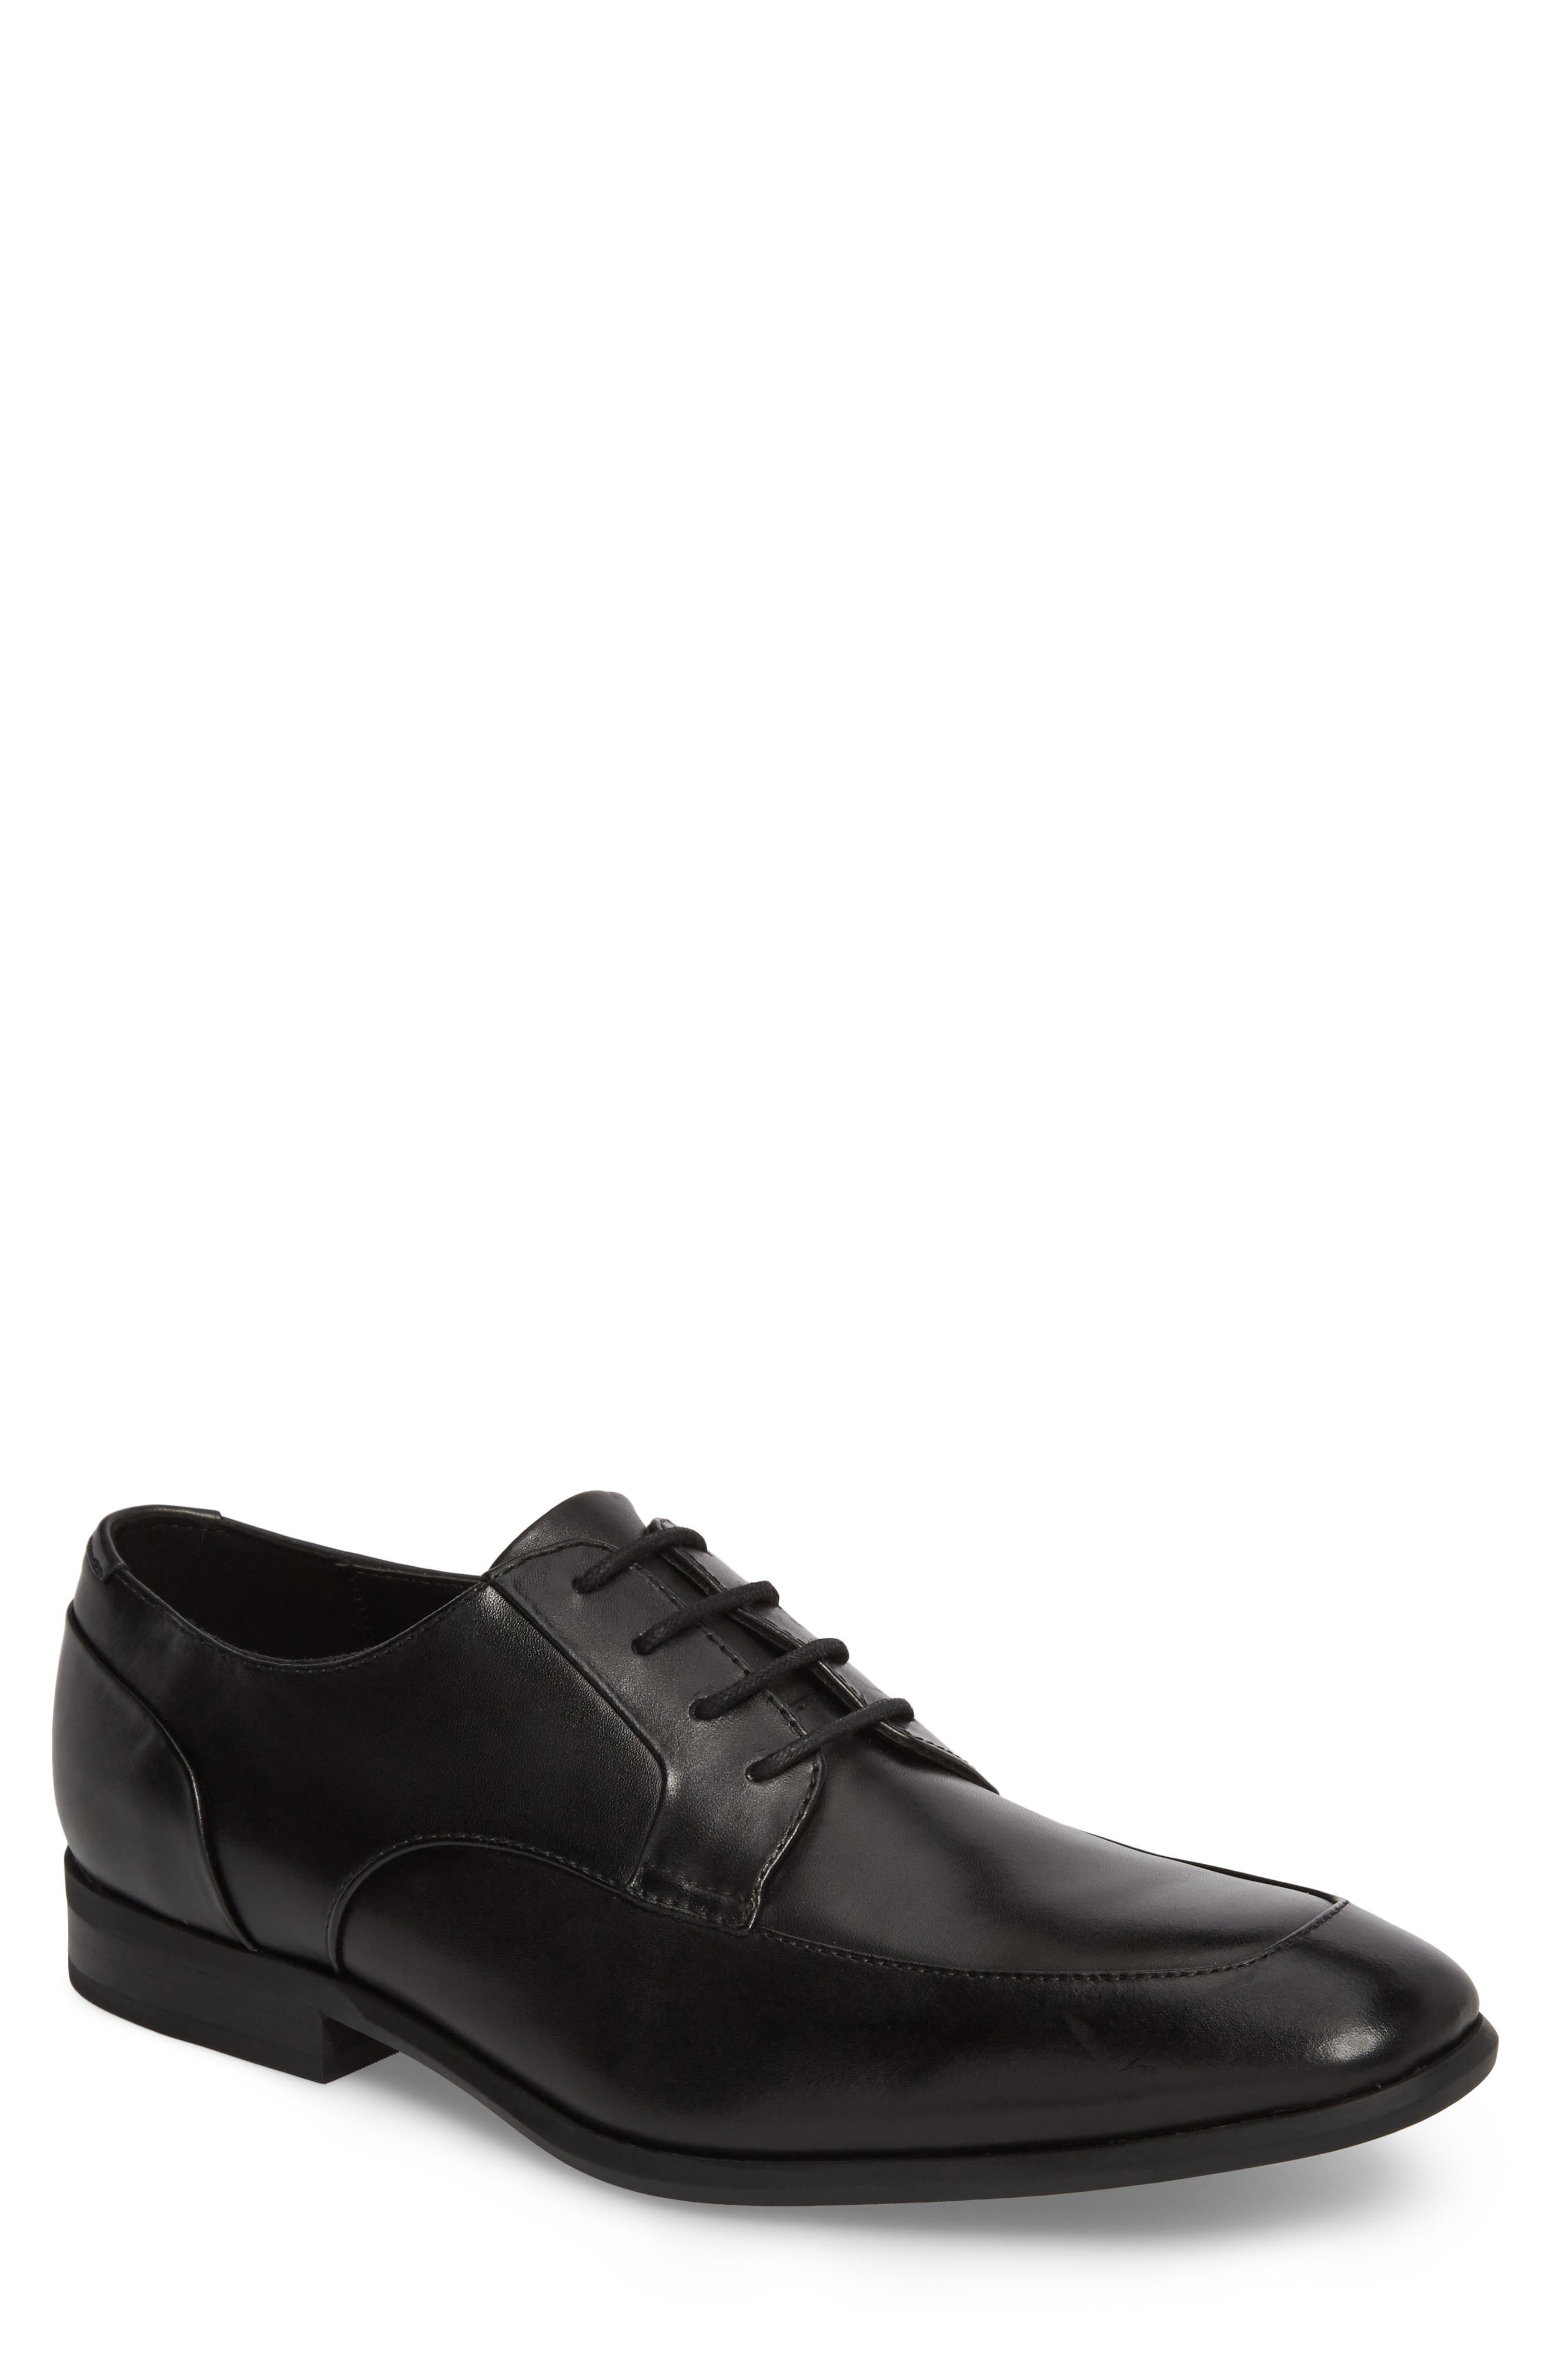 Lazarus Apron Toe Derby,                         Main,                         color, Black Leather